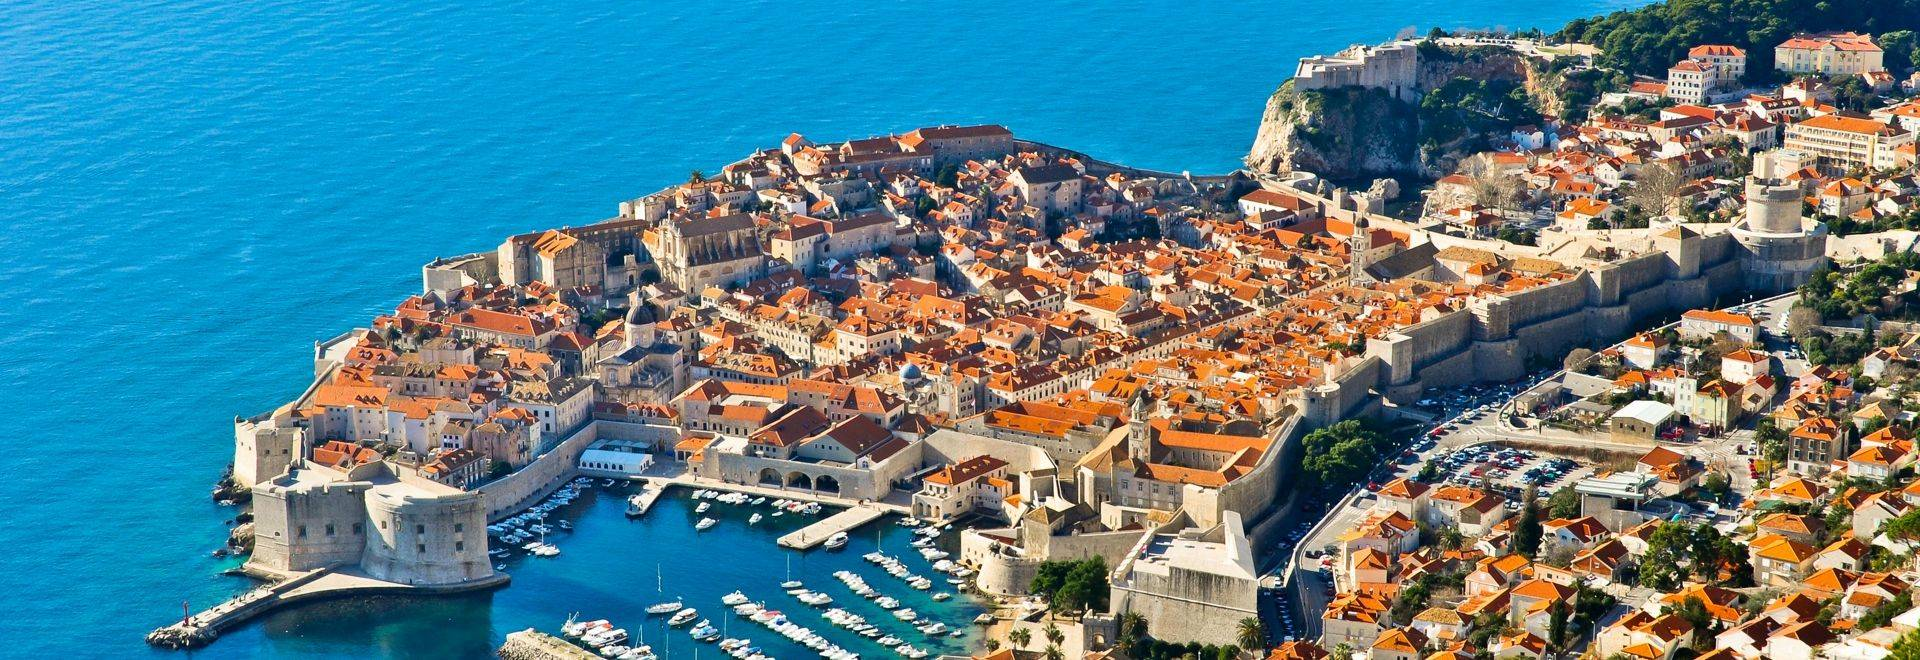 Shutterstock 191271449 Delightful  Dubrovnik Old Town   Main